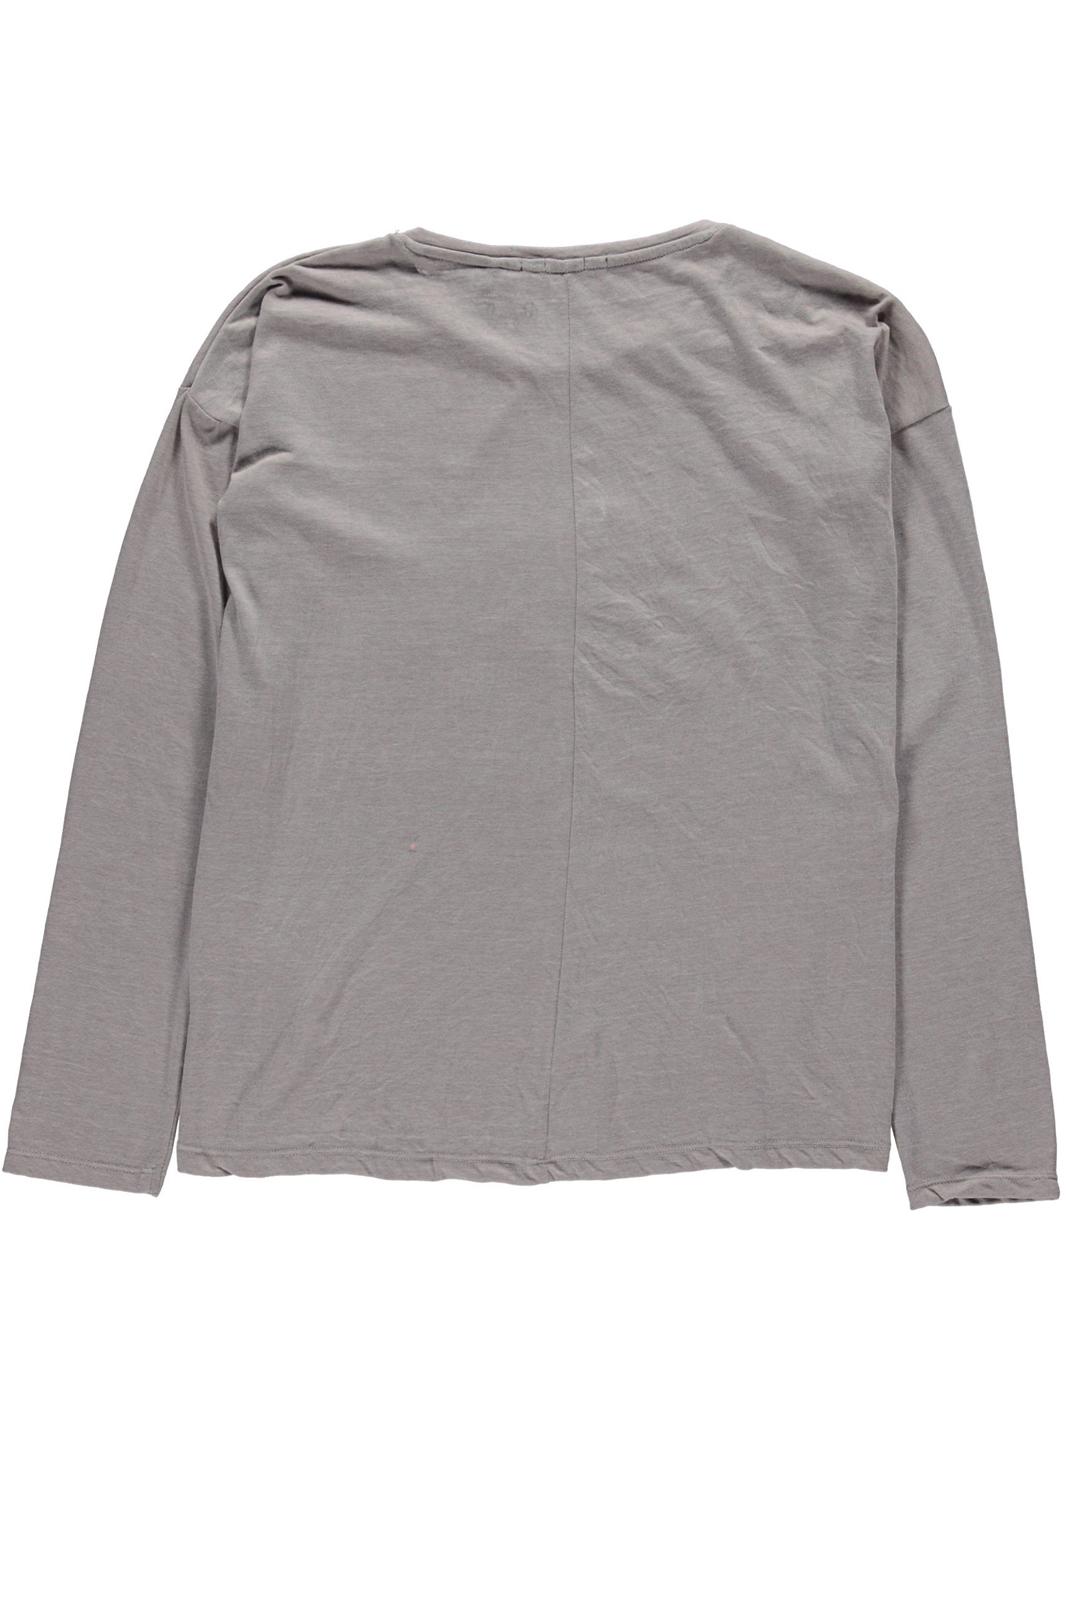 Hauts  Pepe jeans PG500938 sonya 905